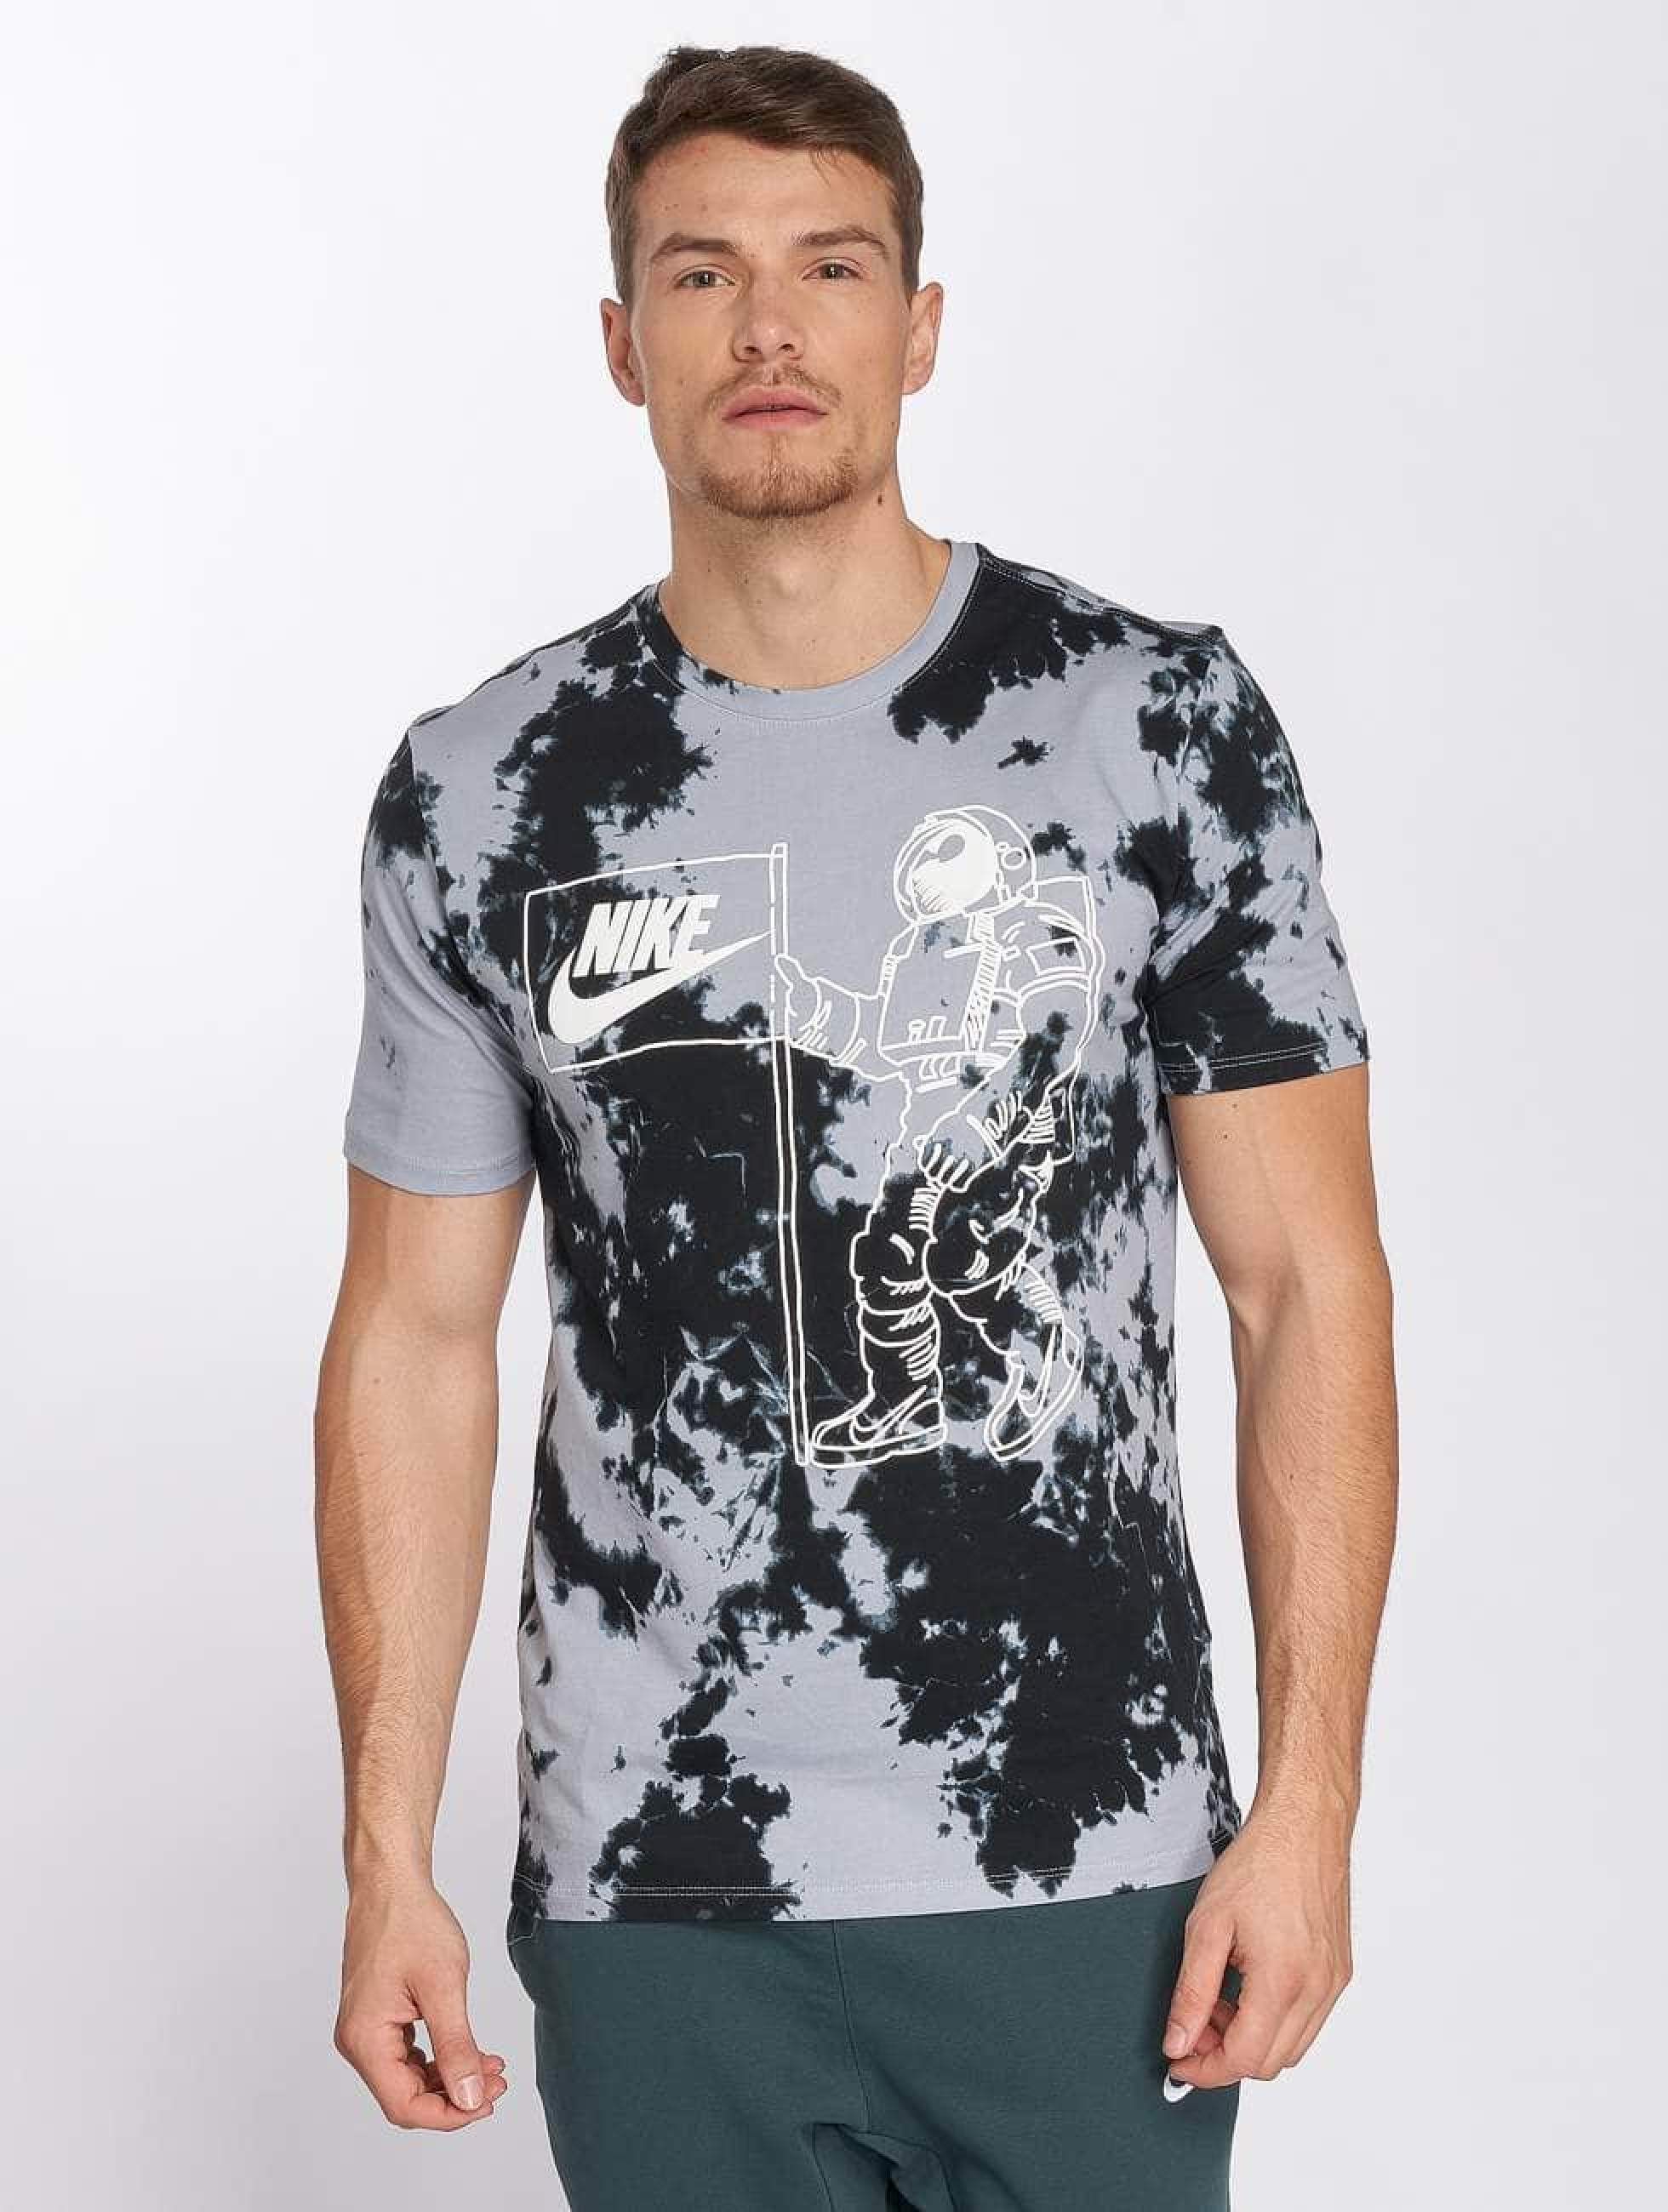 United Nike Herren T-shirt Fitness-shirt Pro Hypercool Top Ss Grau Sporting Goods